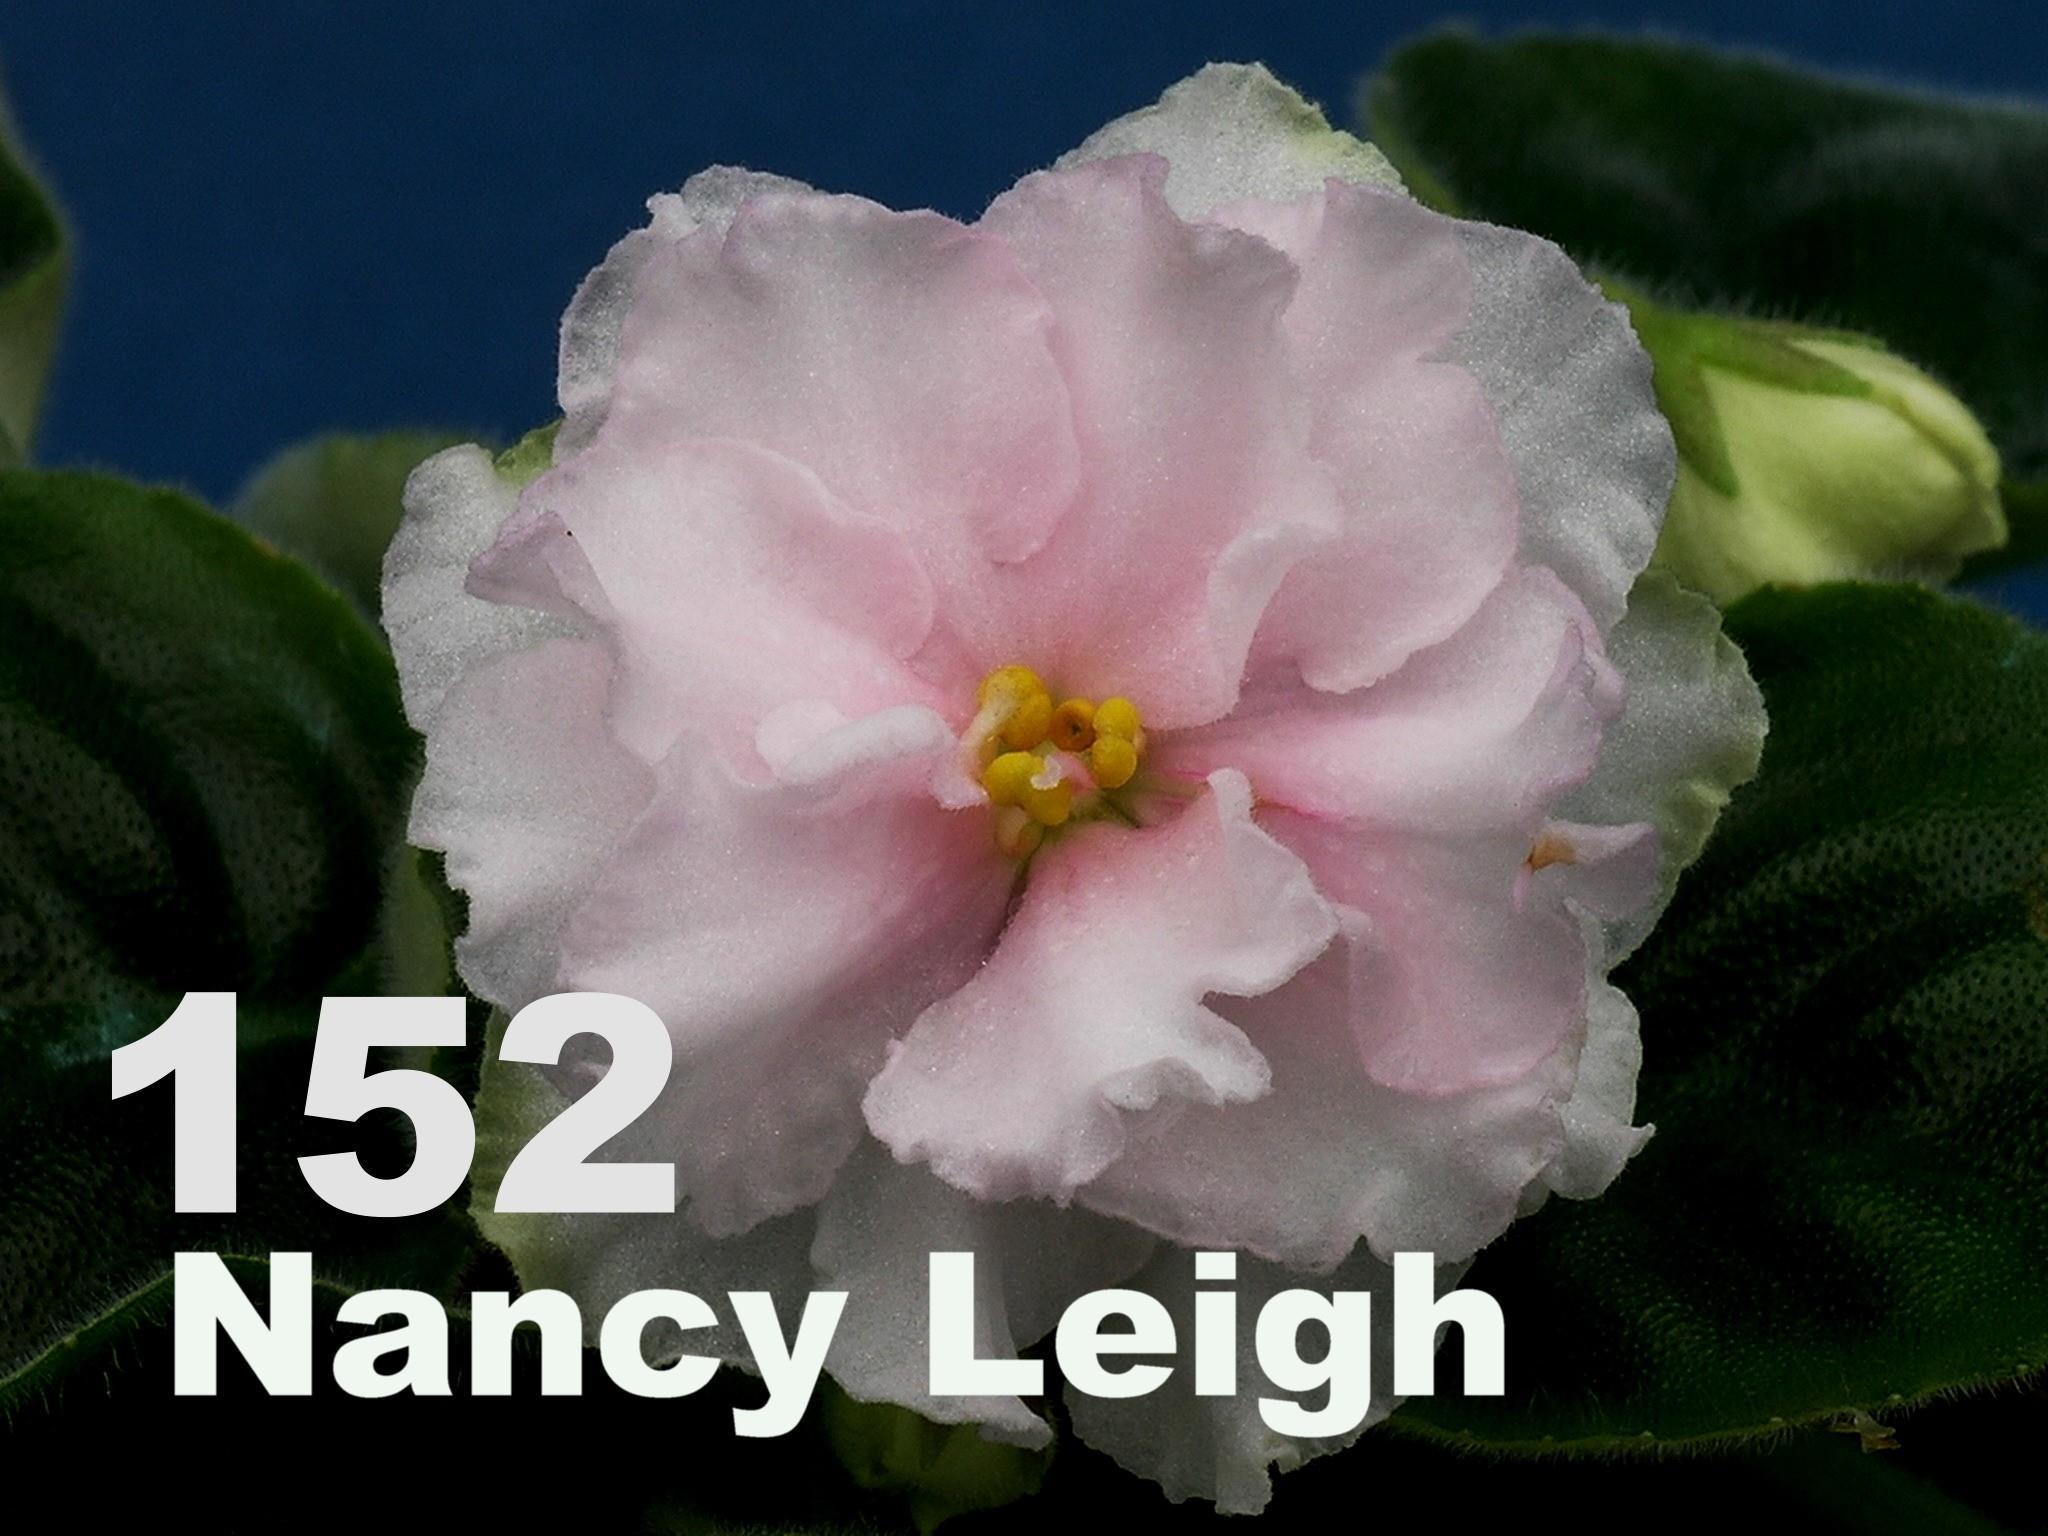 [152] Nancy Leigh 152